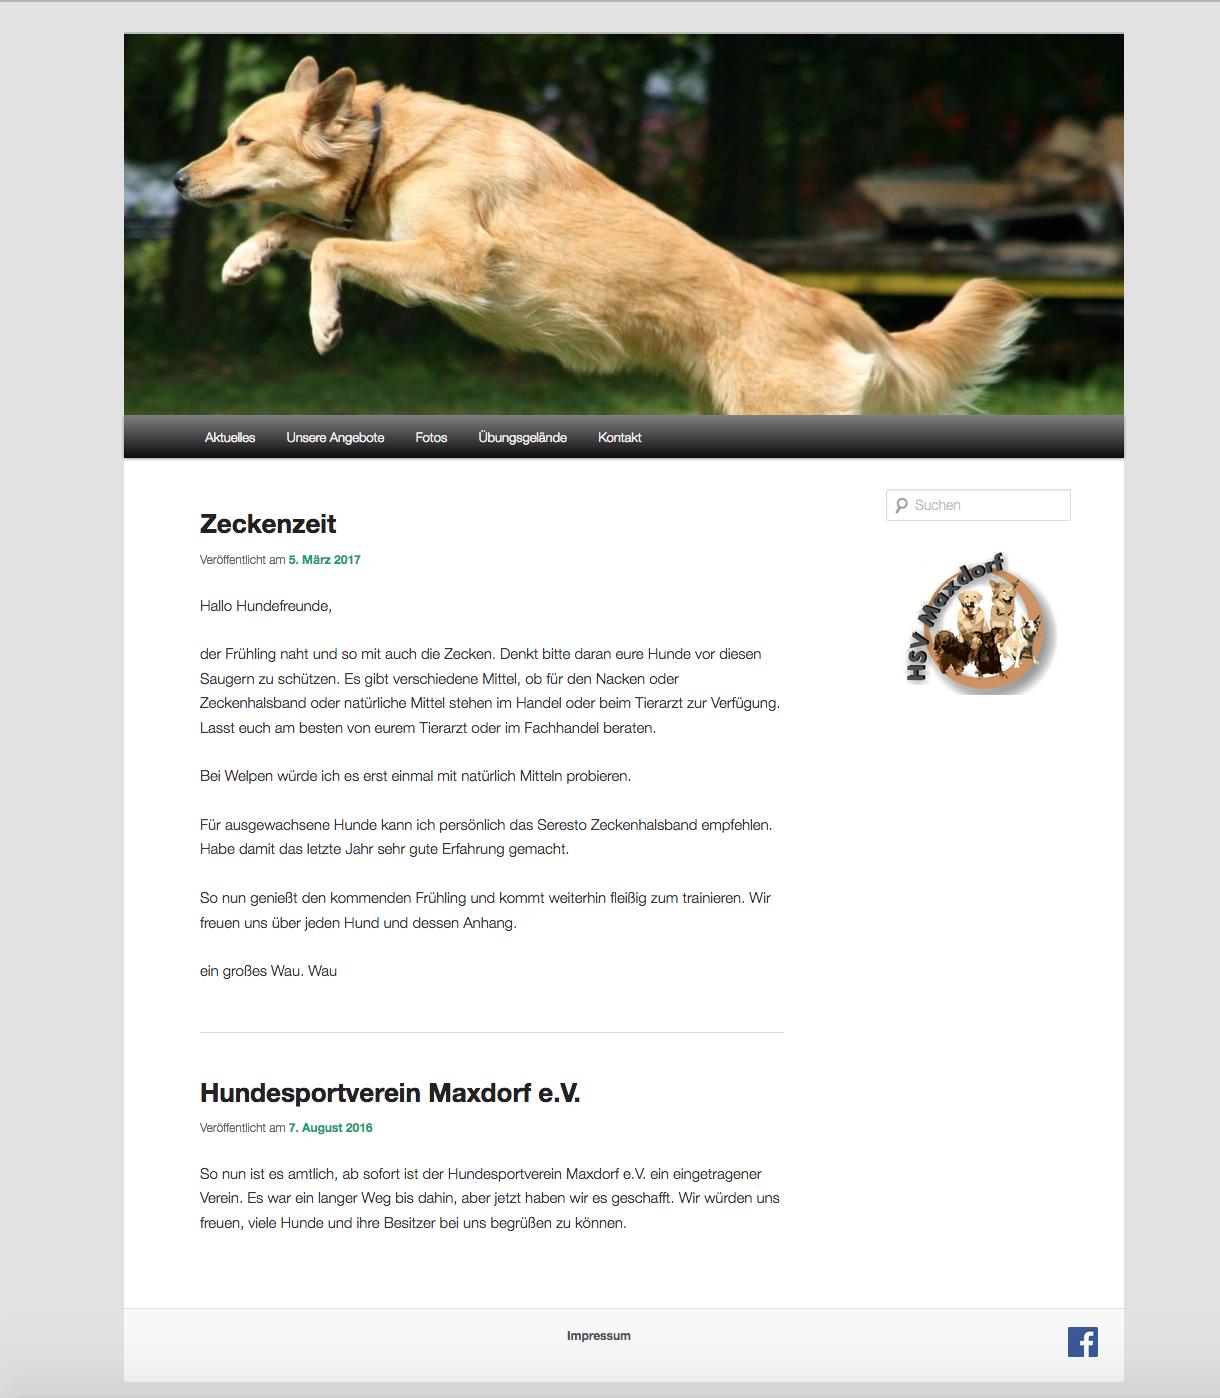 Hundesportverein Maxdorf Webseite Screenshot